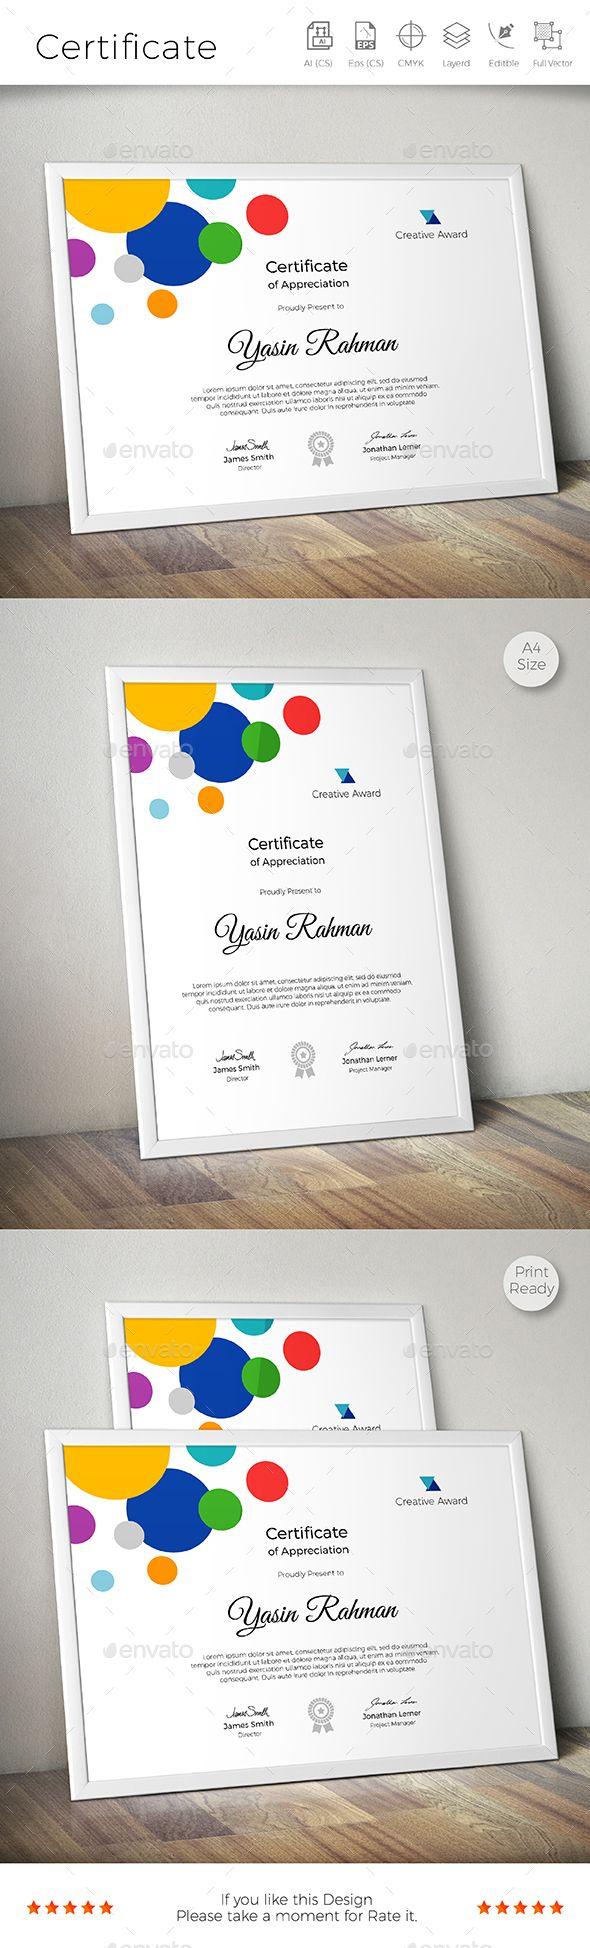 Certificate Design Idea Template - Certificates Template Vector EPS, AI Illustrator. Download here: https://graphicriver.net/item/certificate/17026955?s_rank=117&ref=yinkira